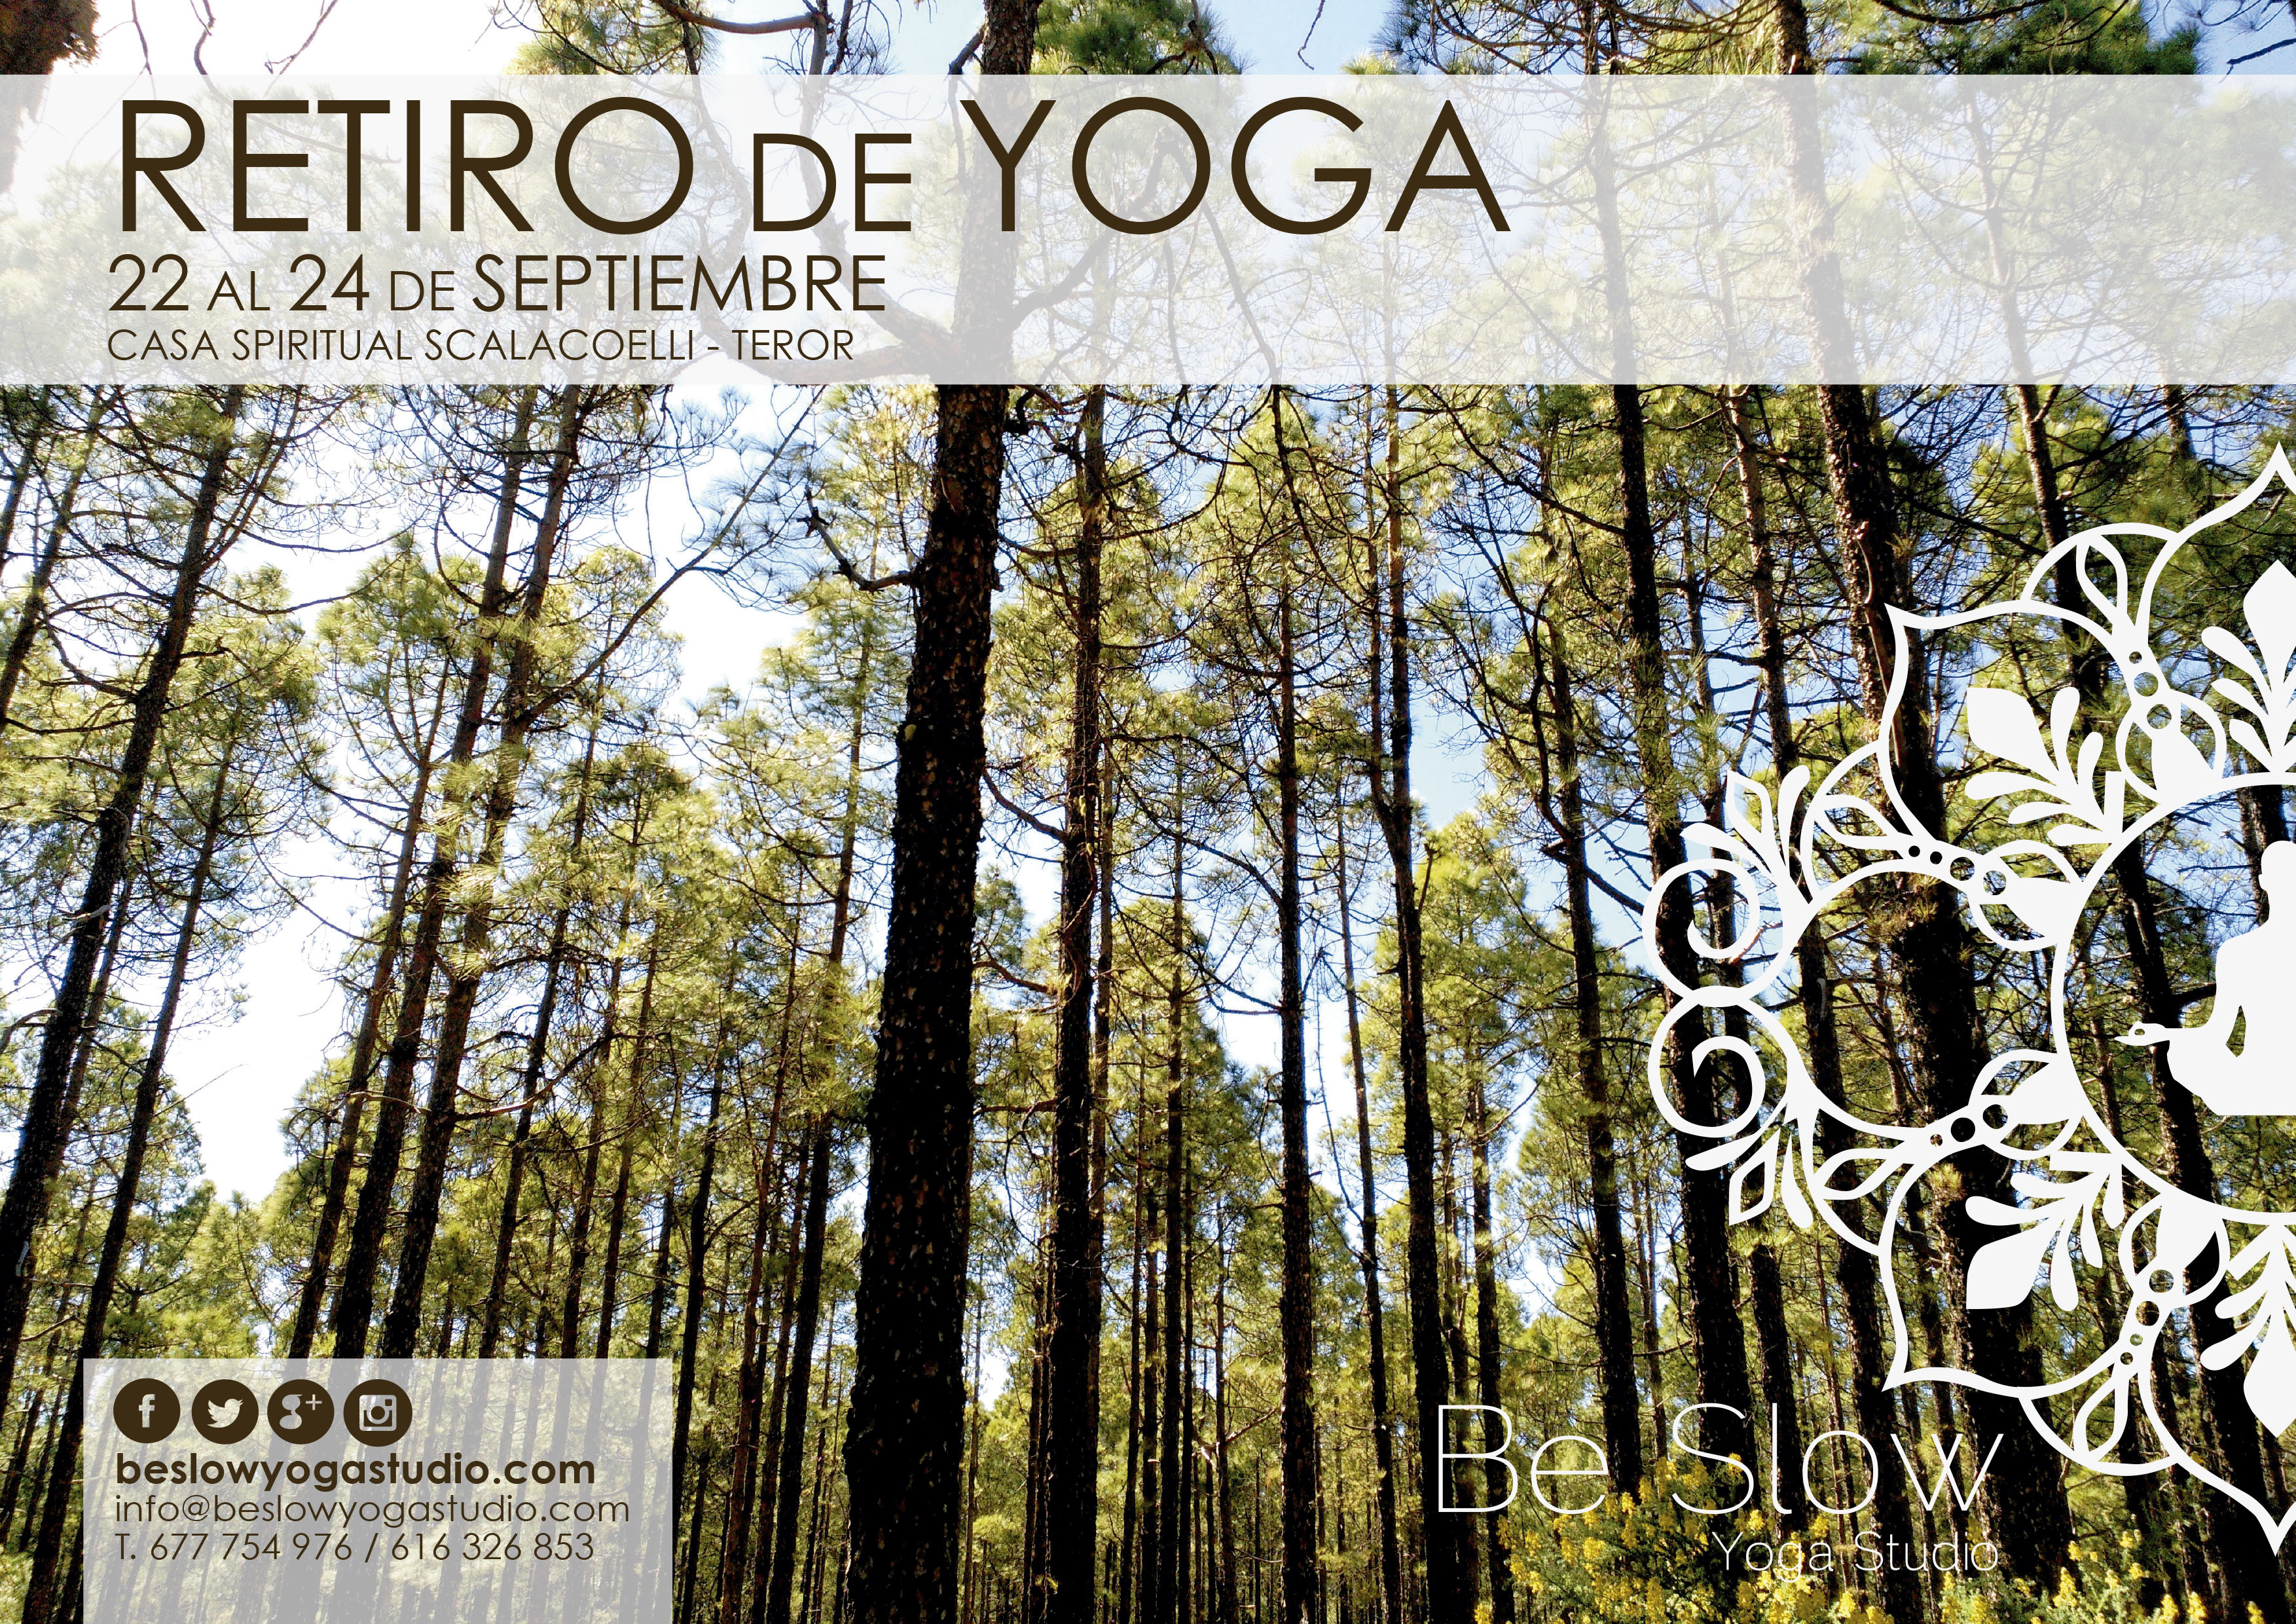 Retiro de Yoga en Gran Canaria